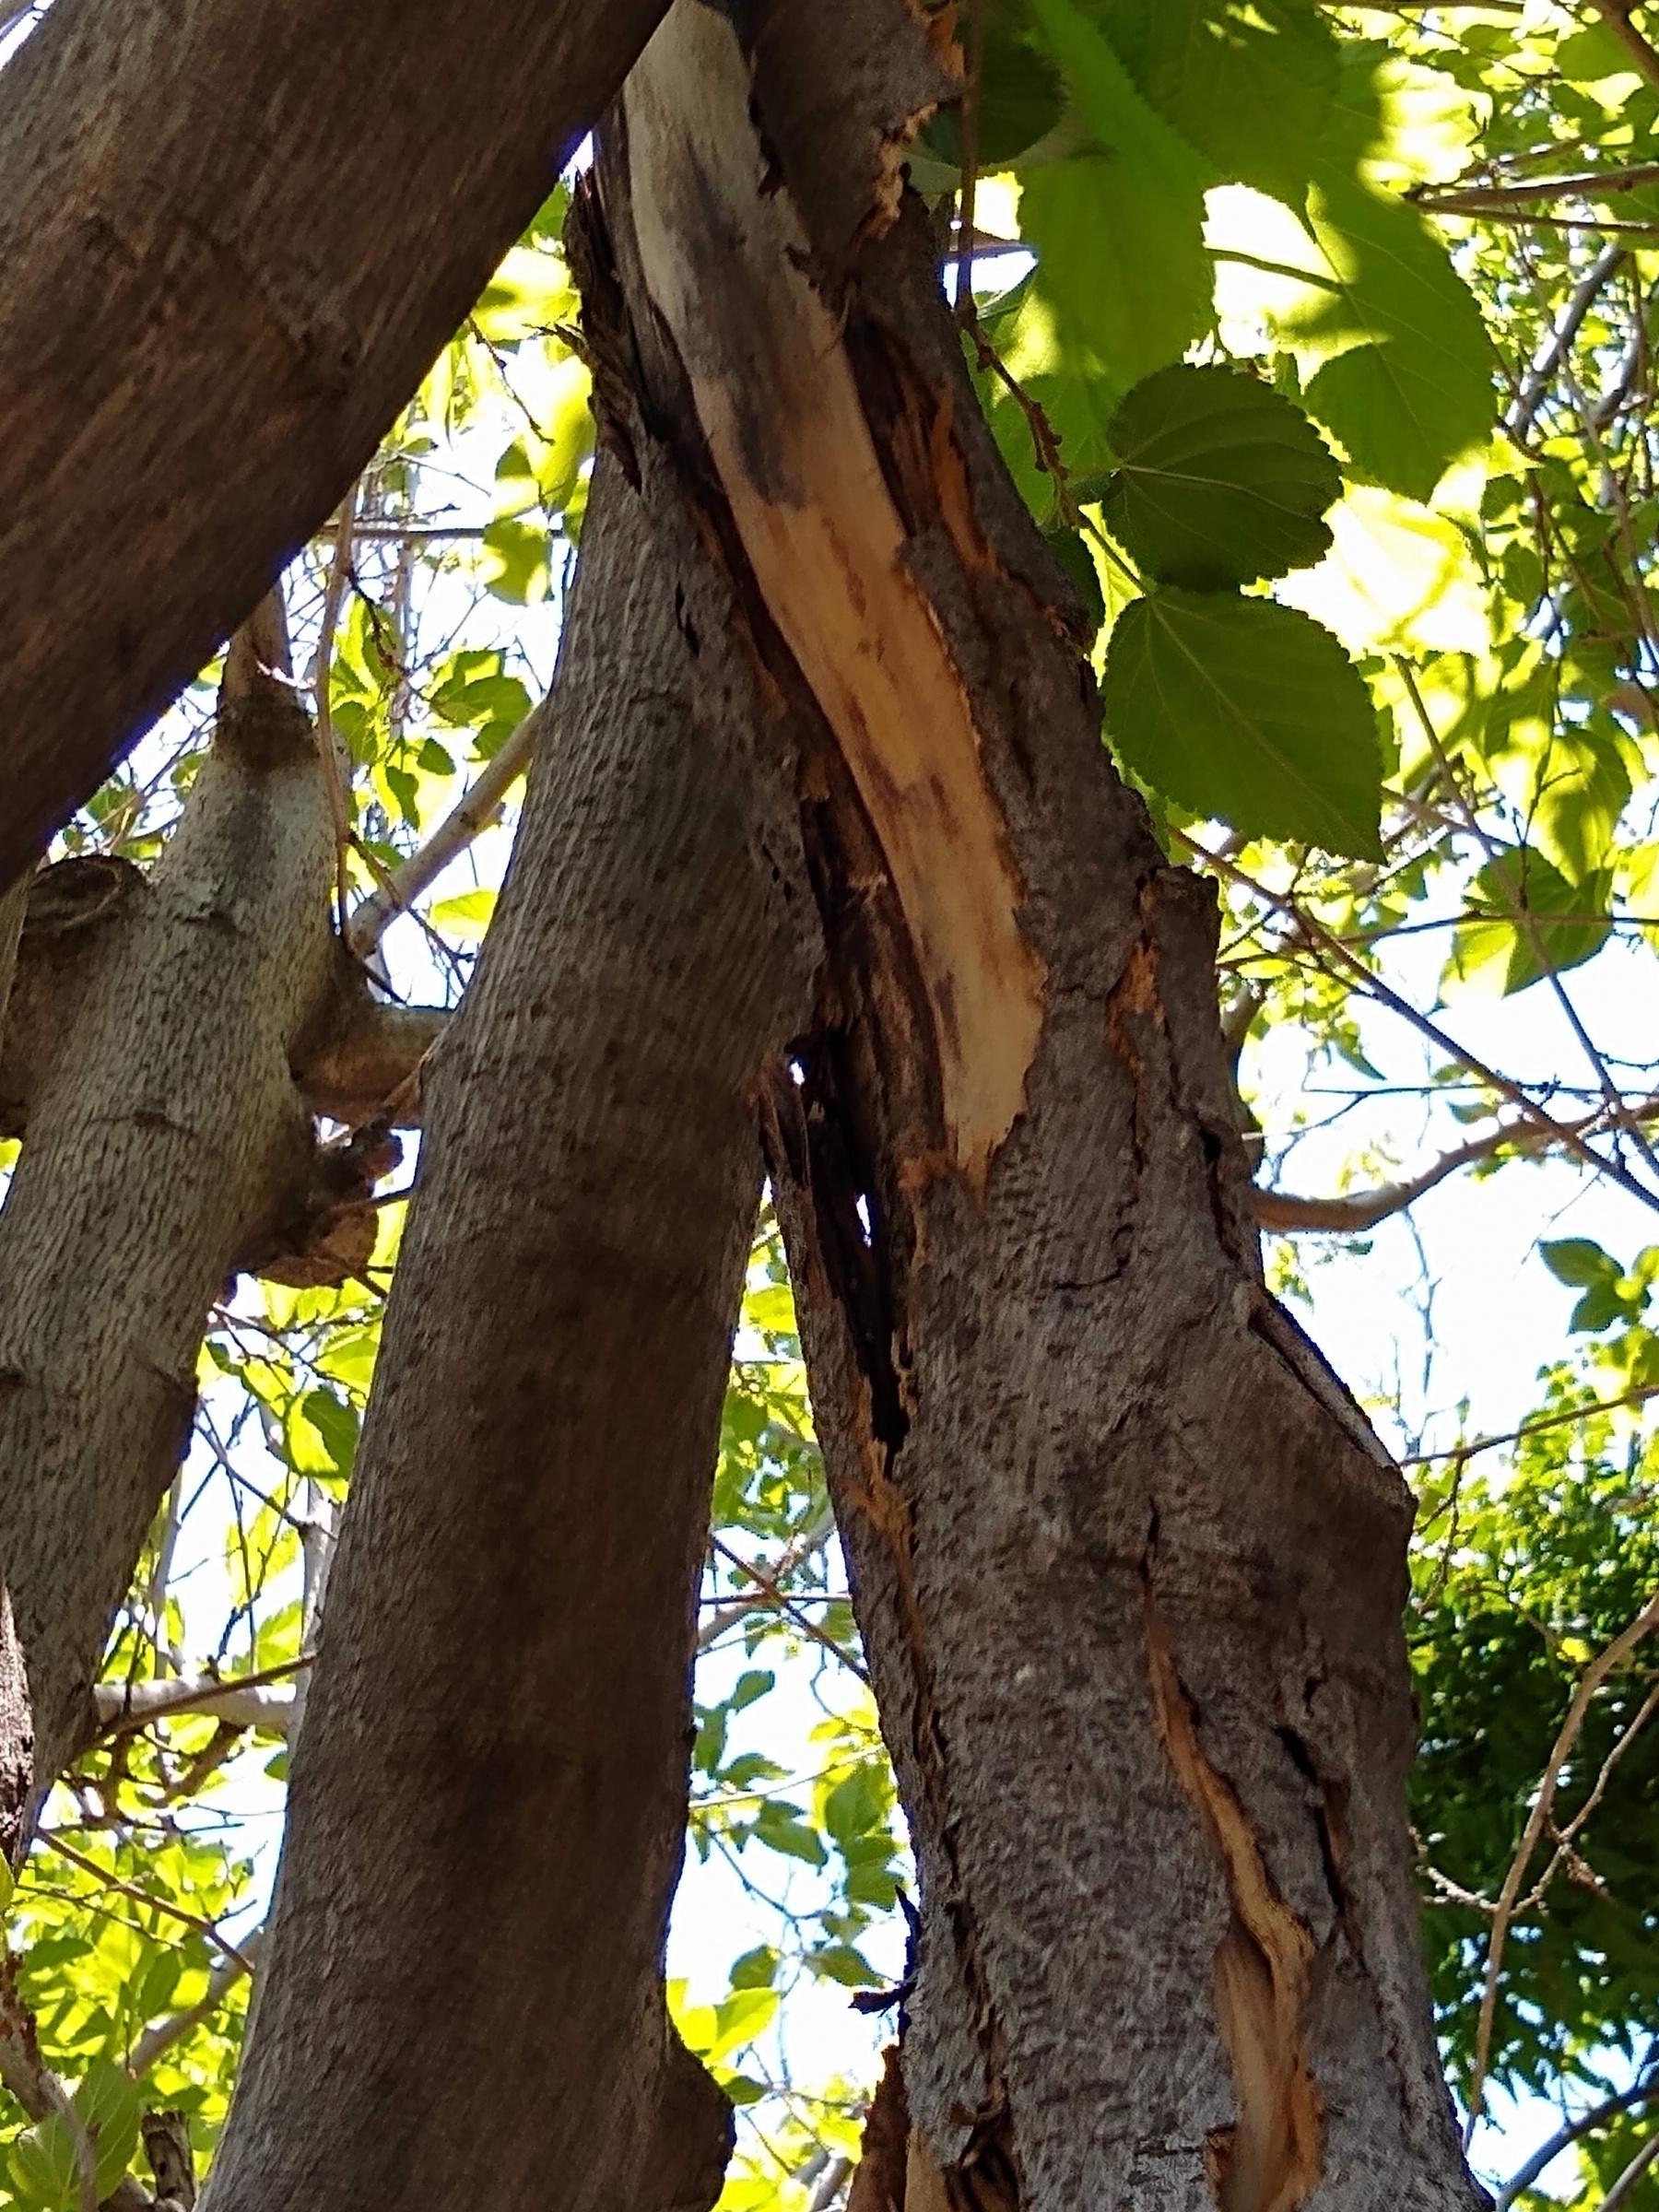 Mulberry tree crack-img_20200611_125104978.jpg